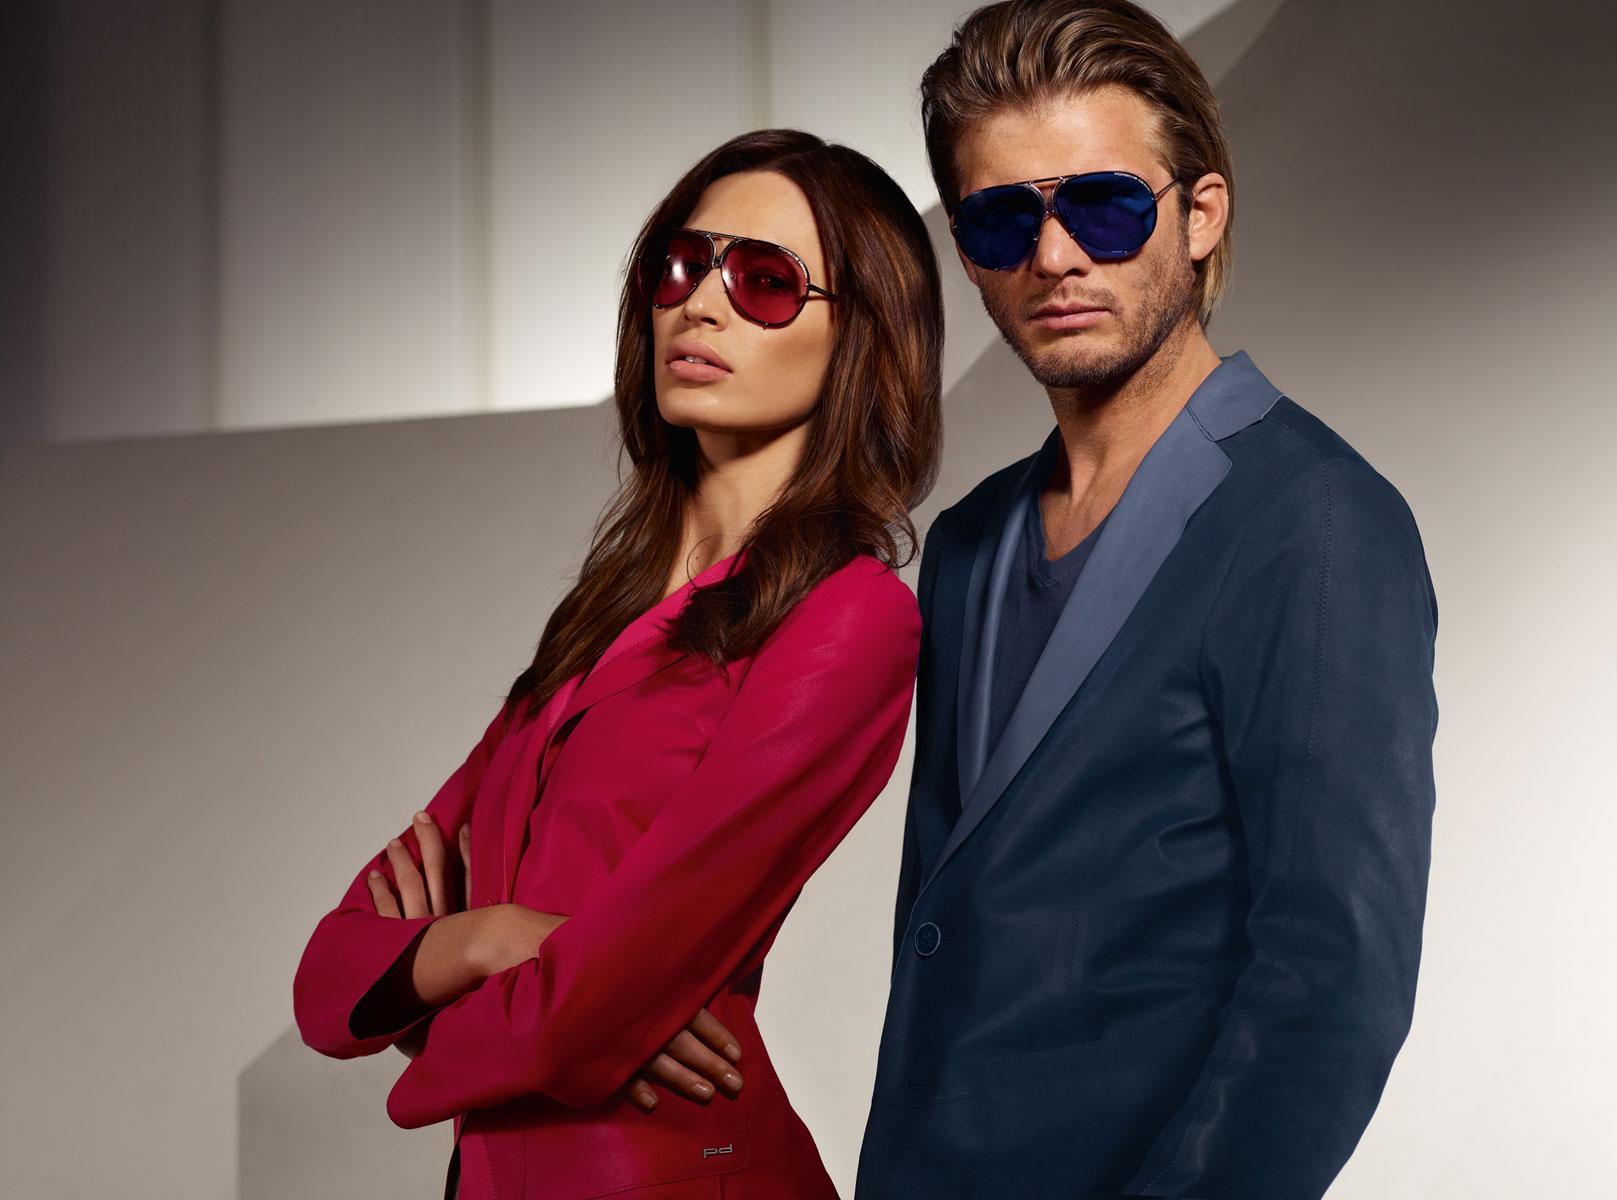 New Exclusive Colors For Porsche Design P 8478 Sunglasses Extravaganzi